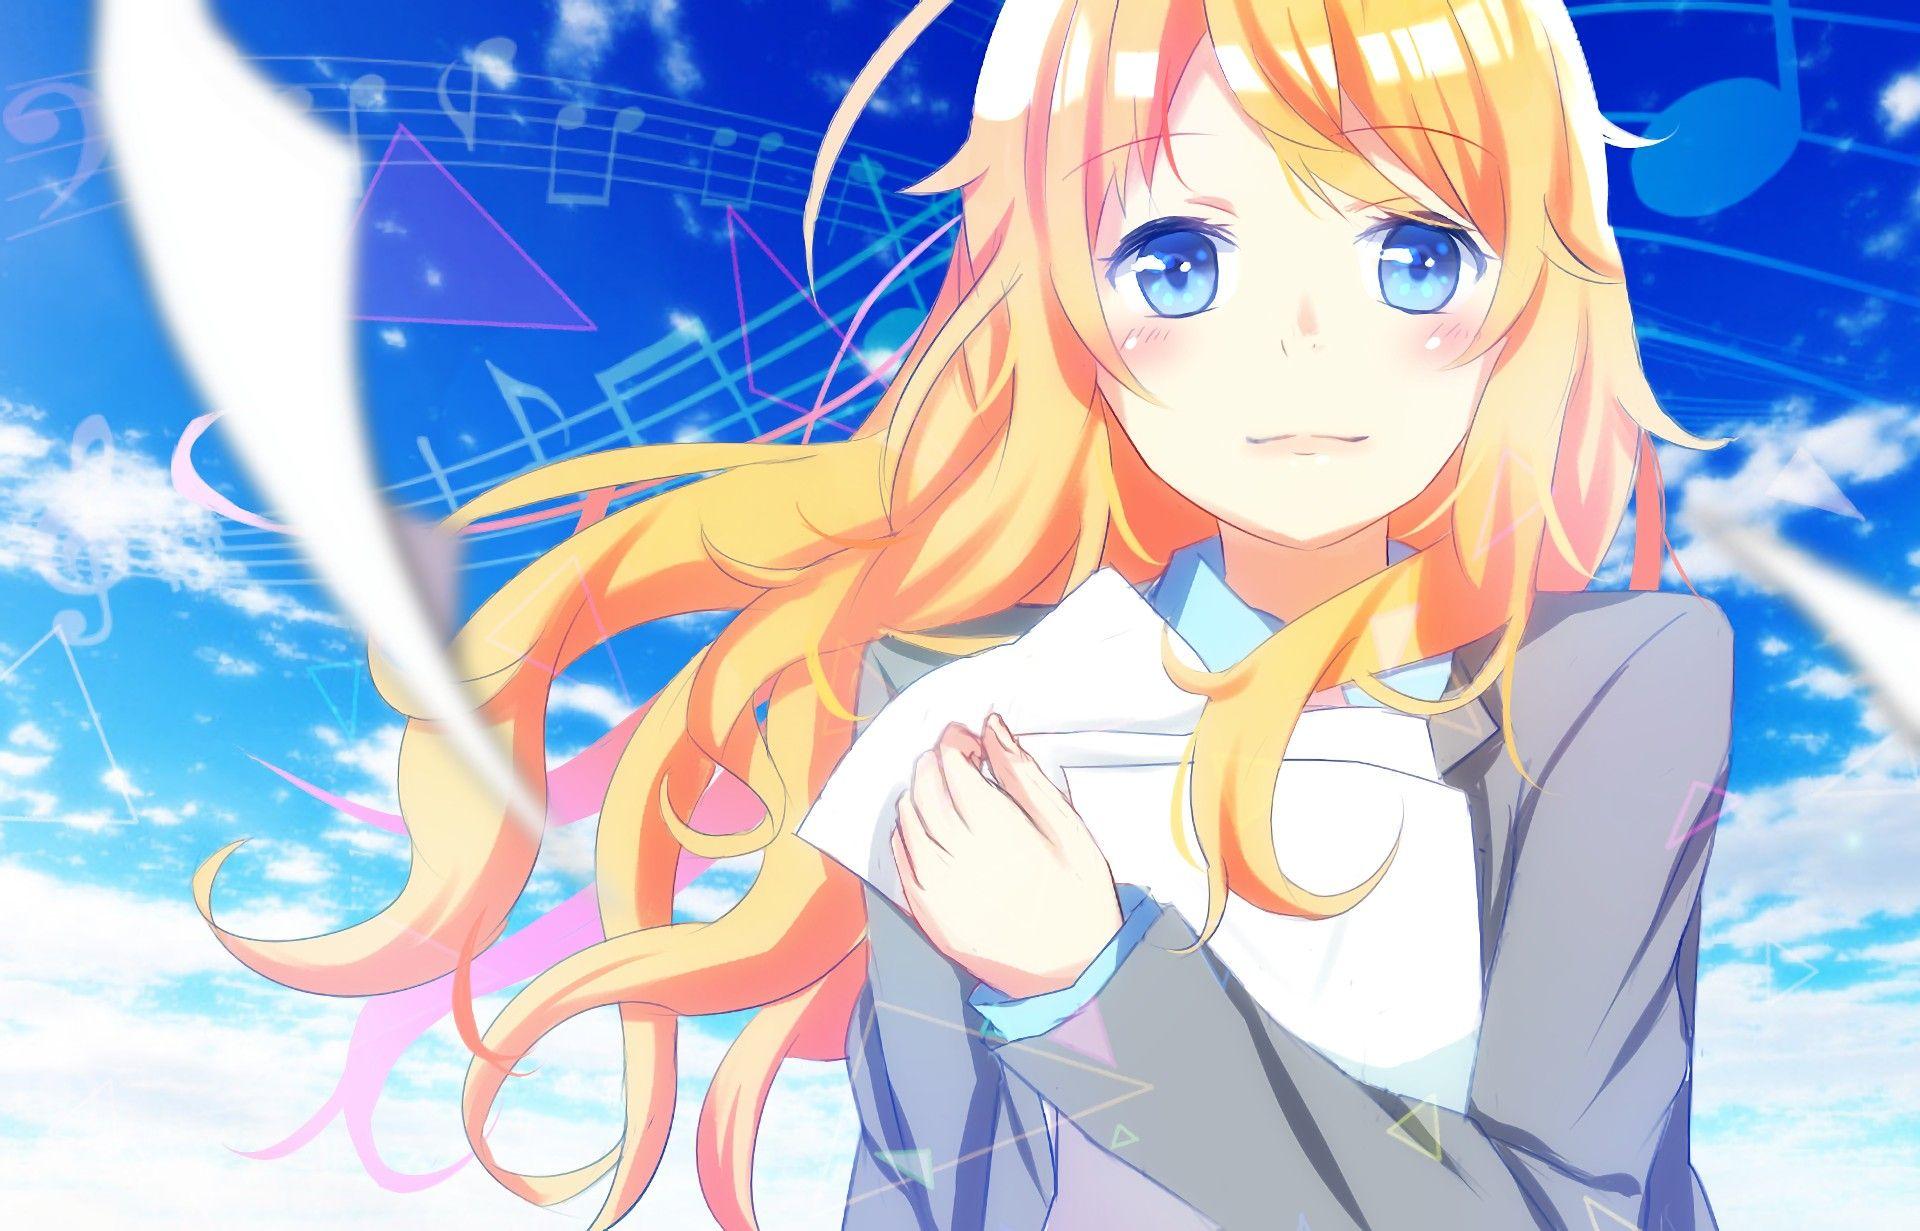 Follow me now Trân Jang Your lie in april, Anime, You lied